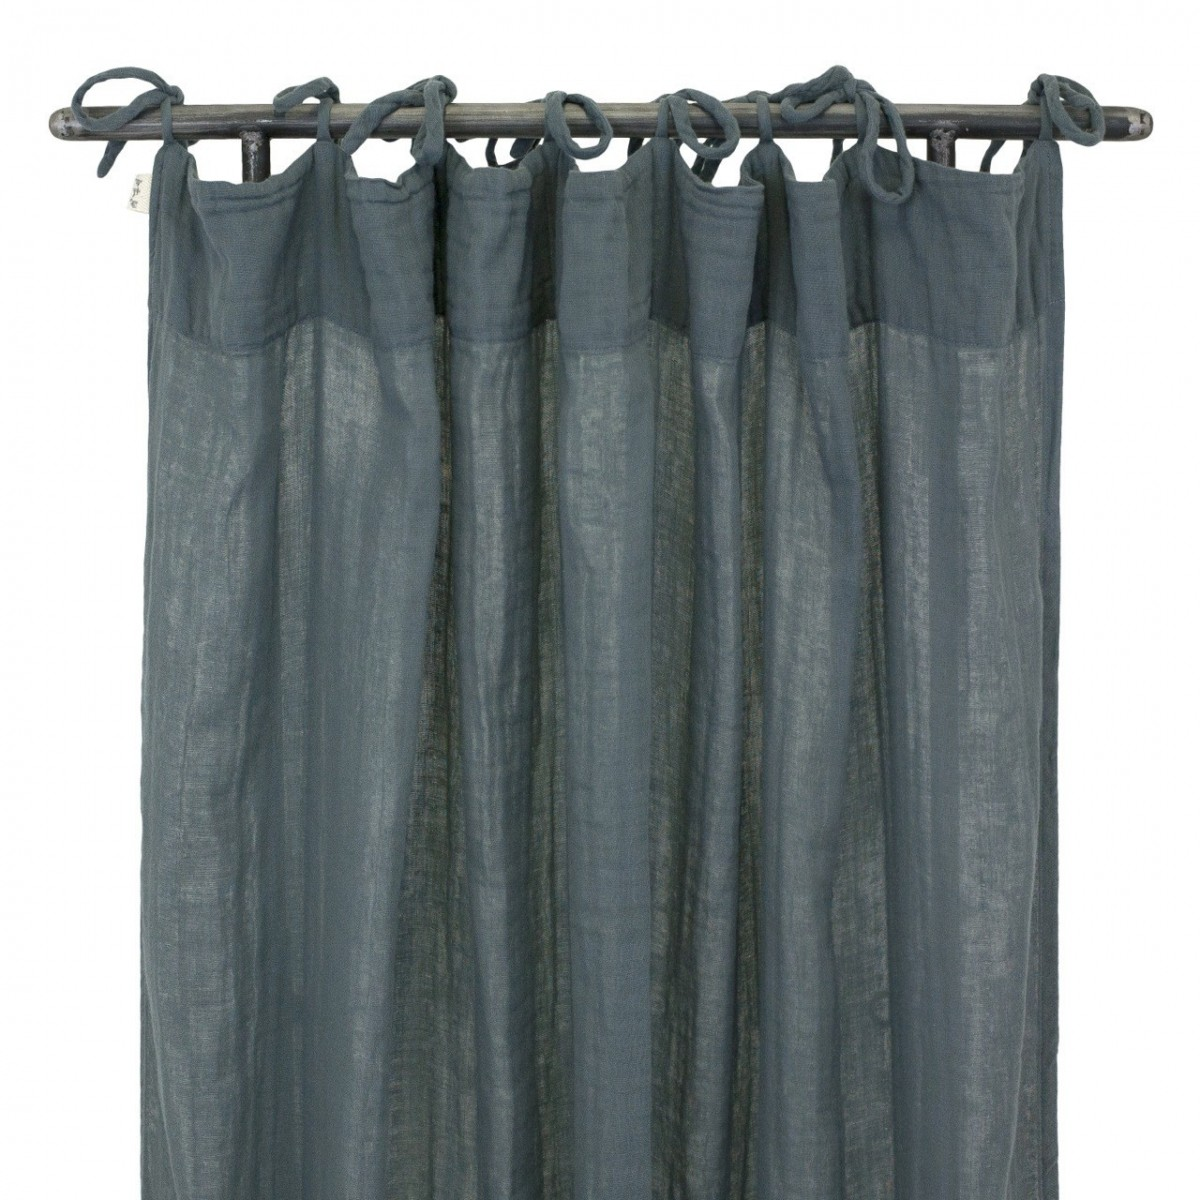 Flat Curtain ice blue - Numero 74